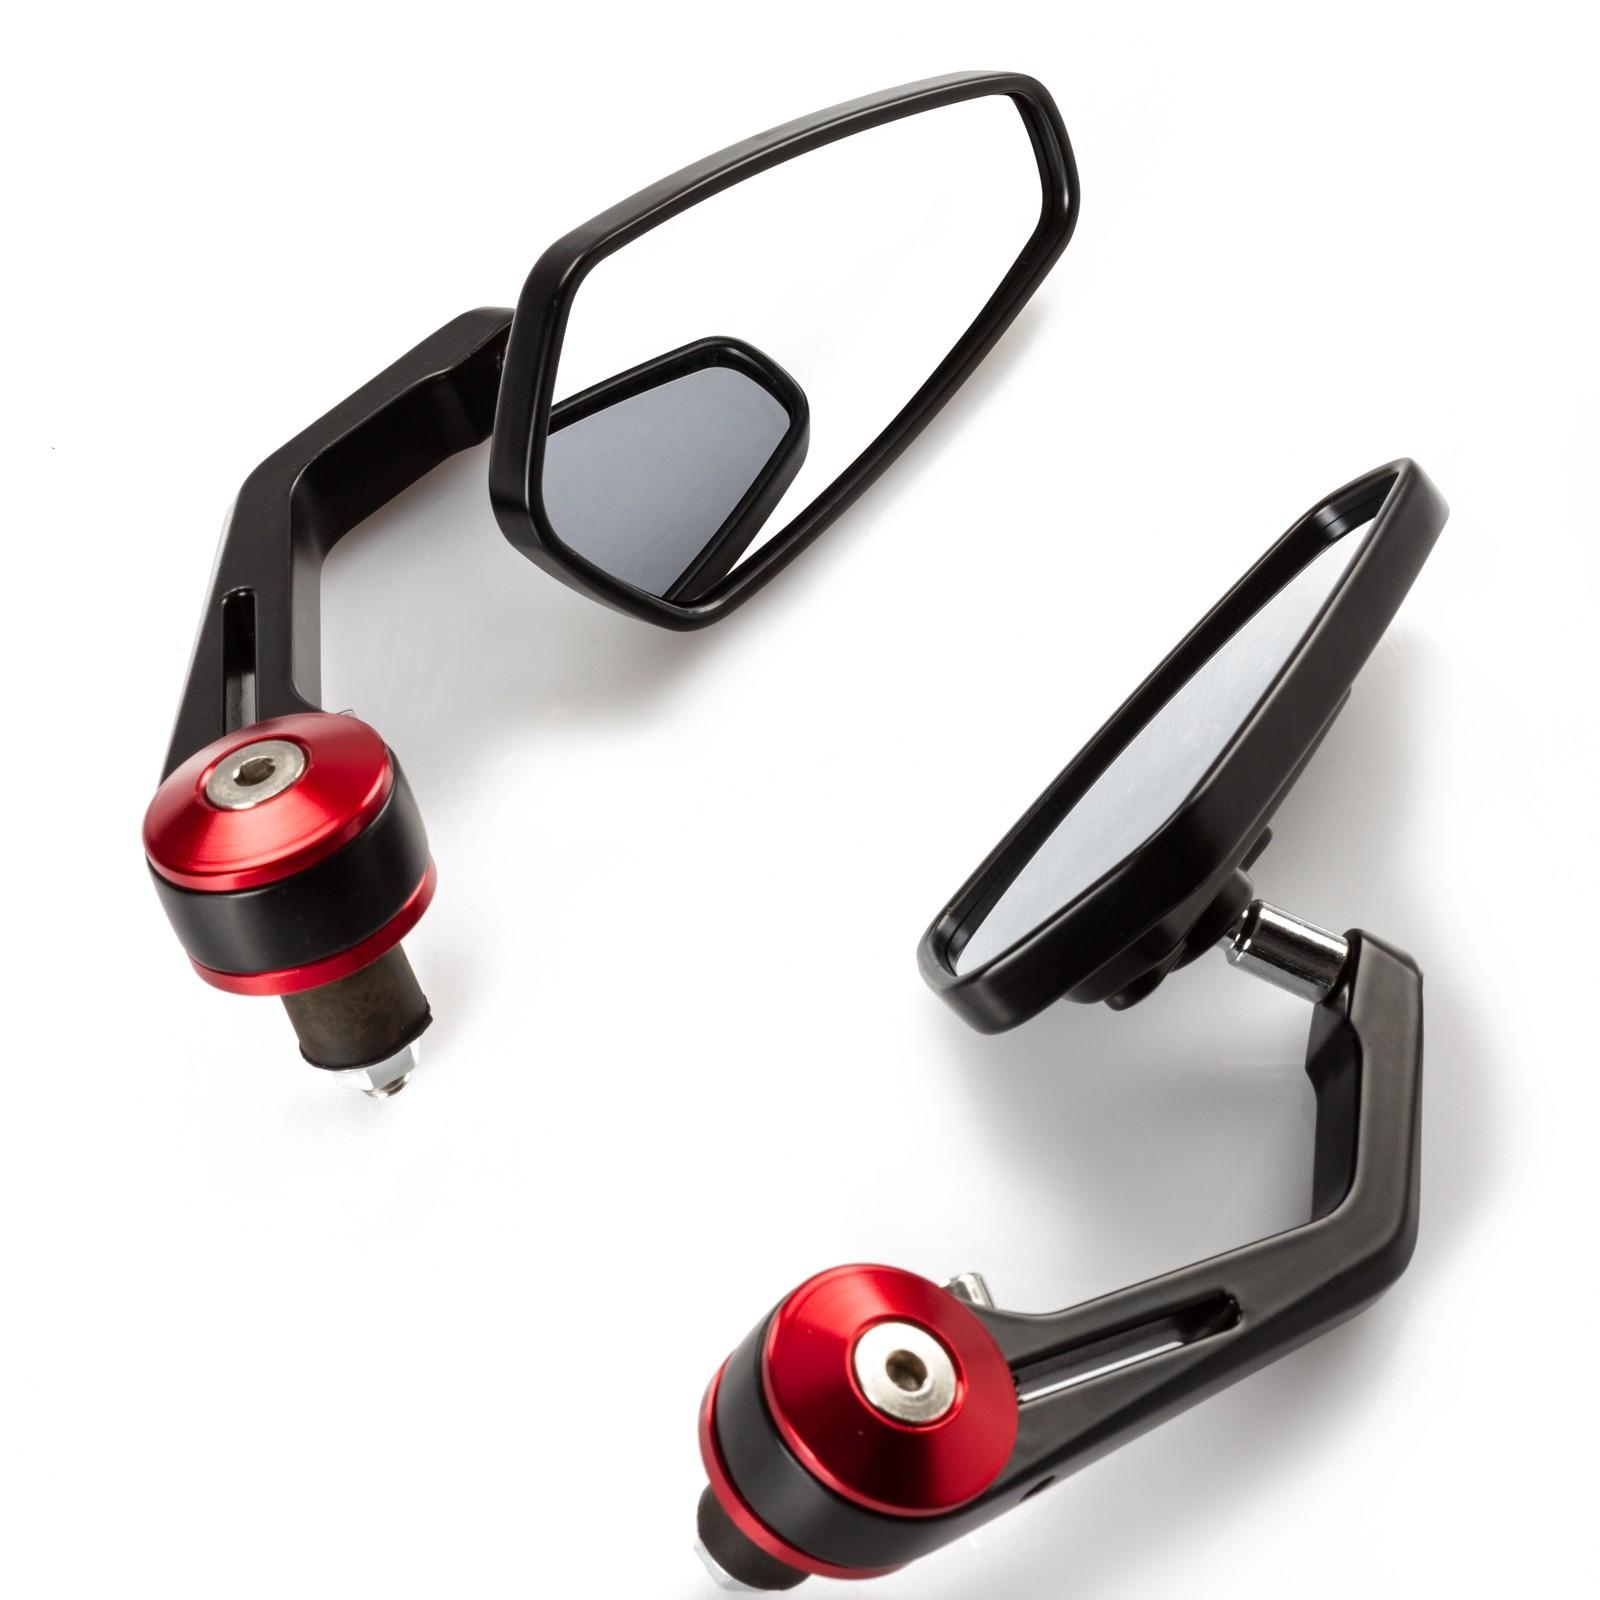 SR4418-Mirrors-Specchietti-Red-Rosso-Motorcycle-Sonic-Moto-Front